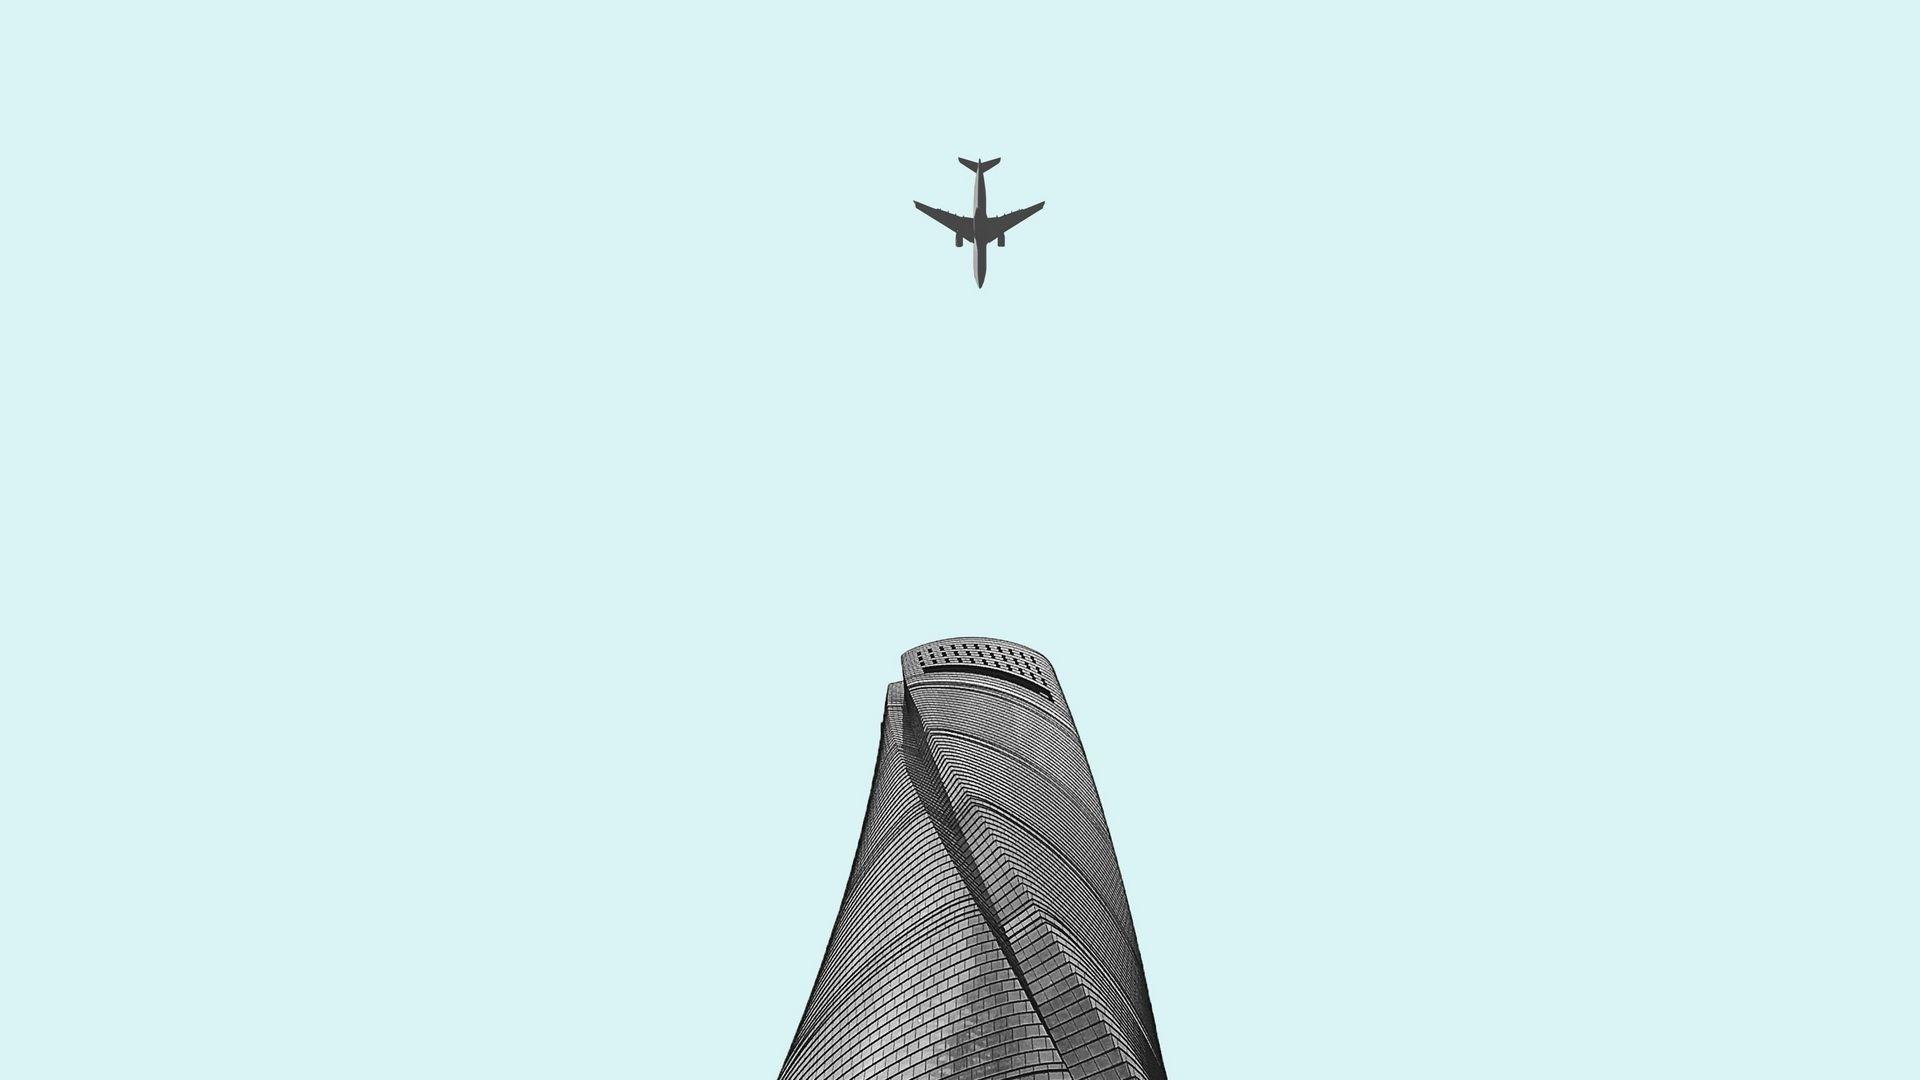 Airplane Minimalist Pic